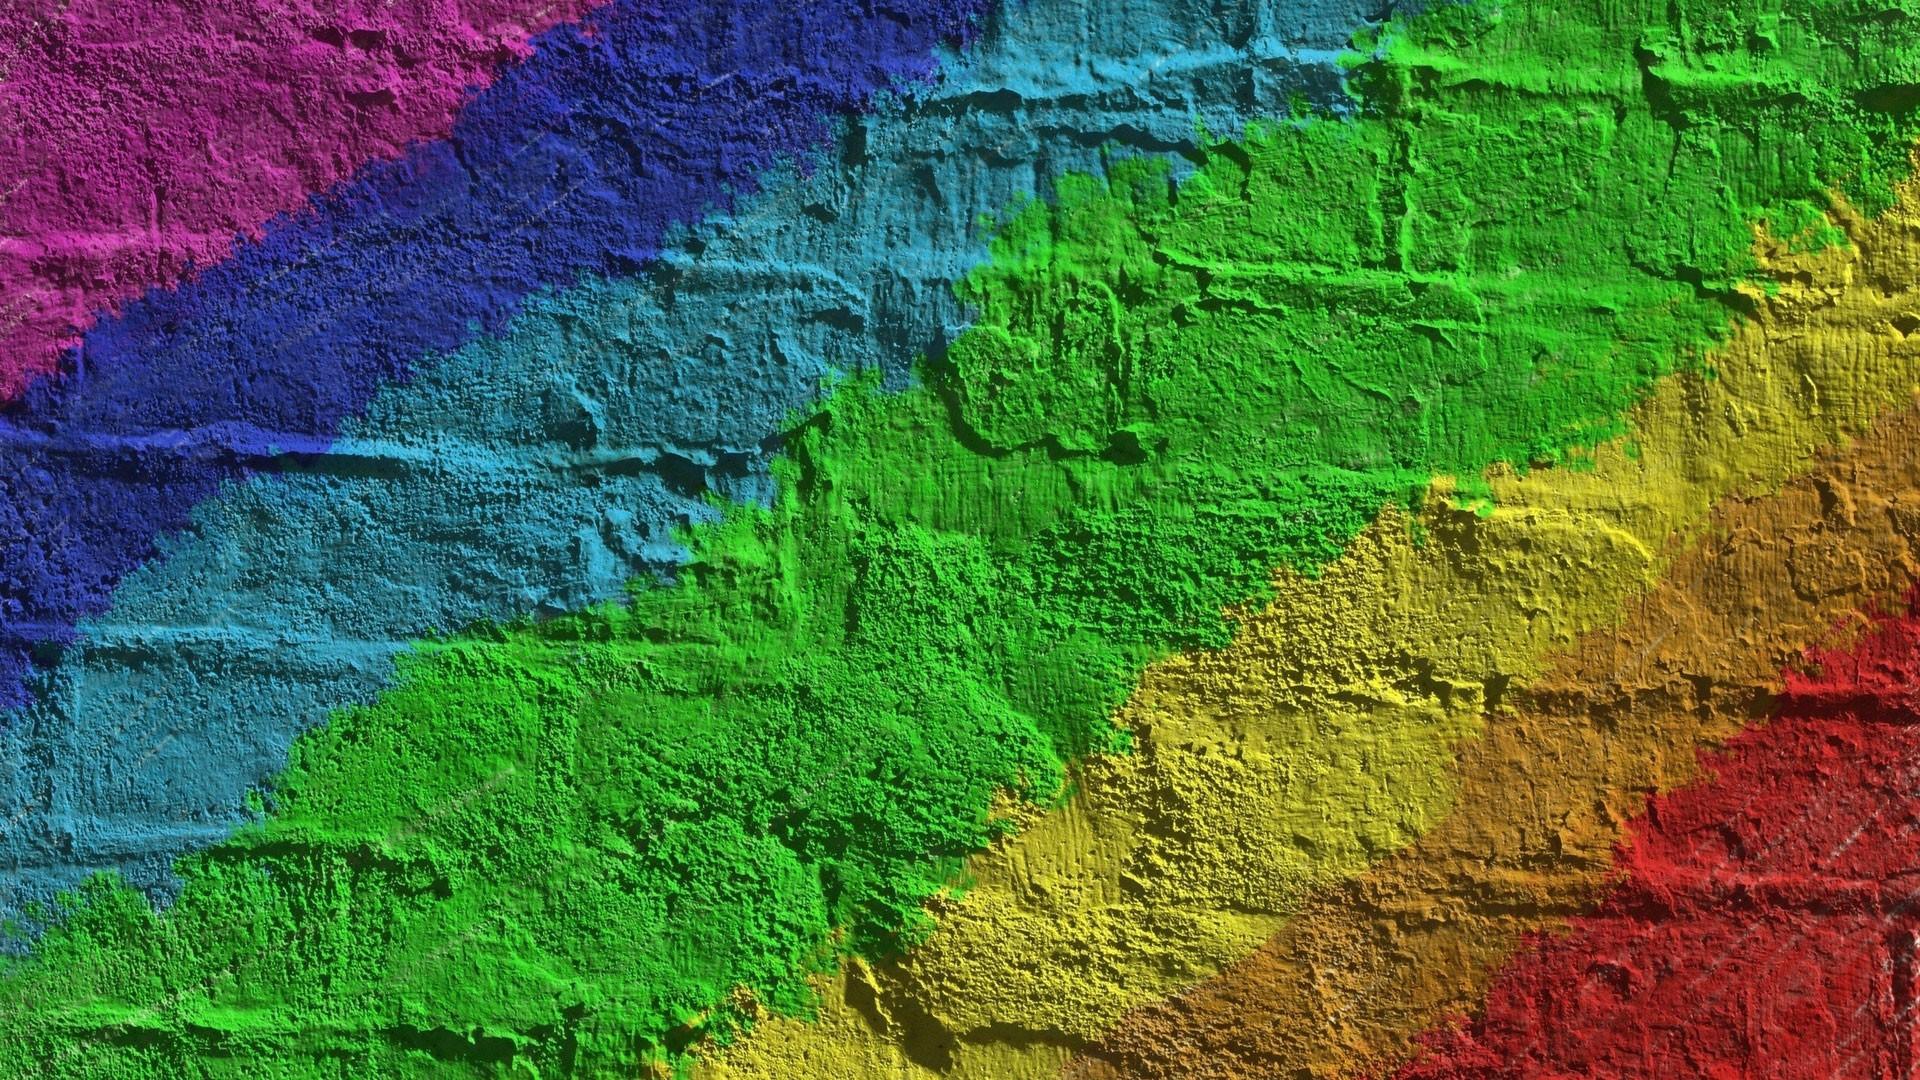 Rainbow wallpaper ·① Download free stunning full HD ...